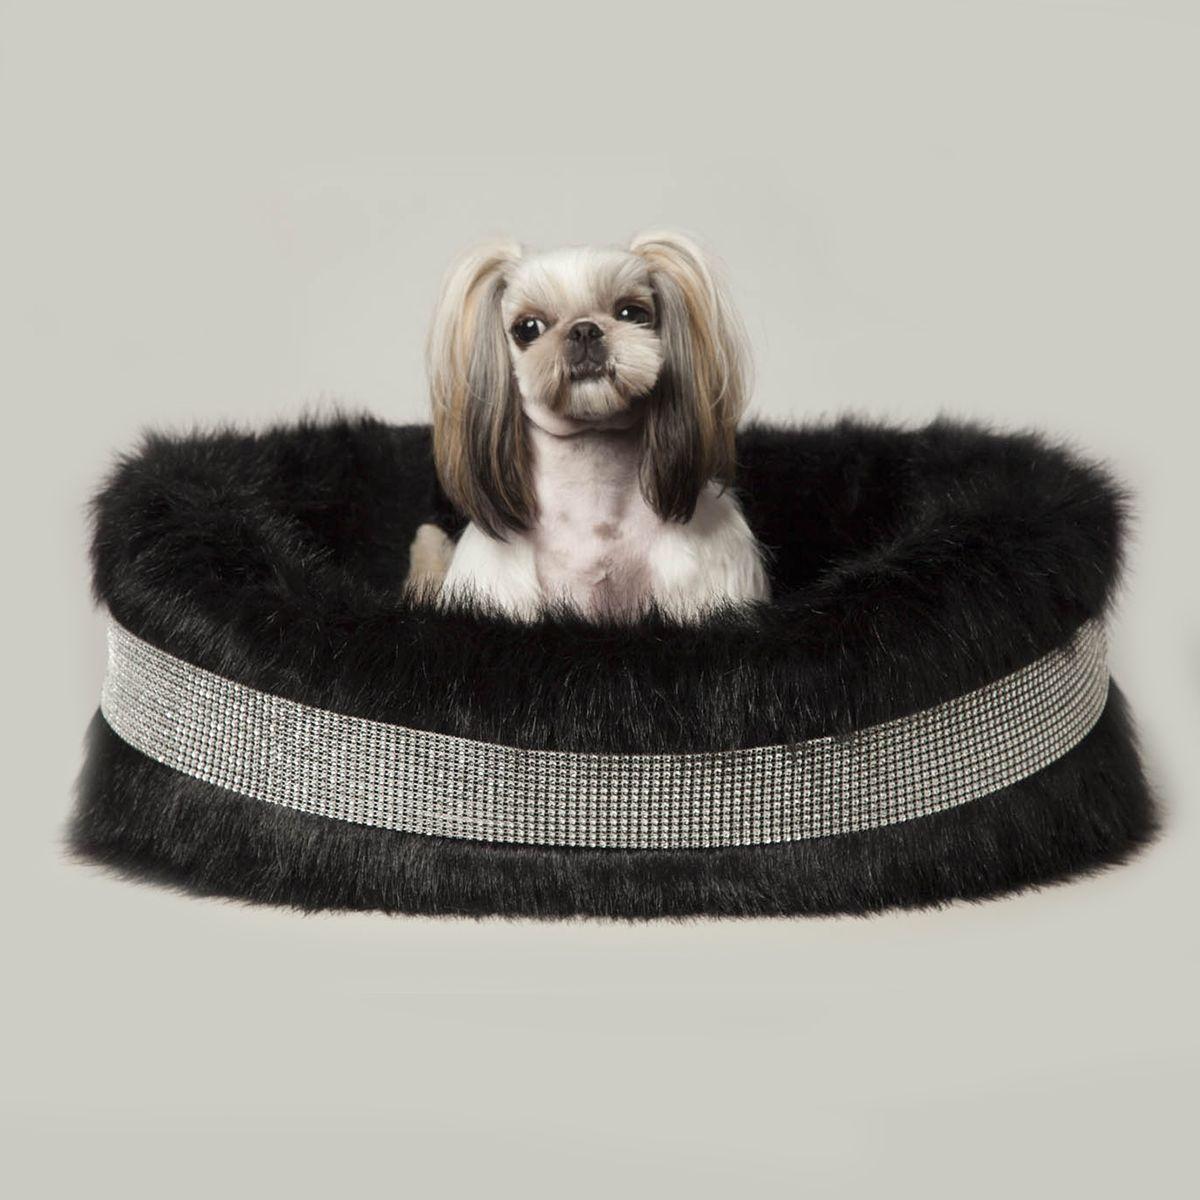 blinky band black faux fur dog bed Faux fur dog beds